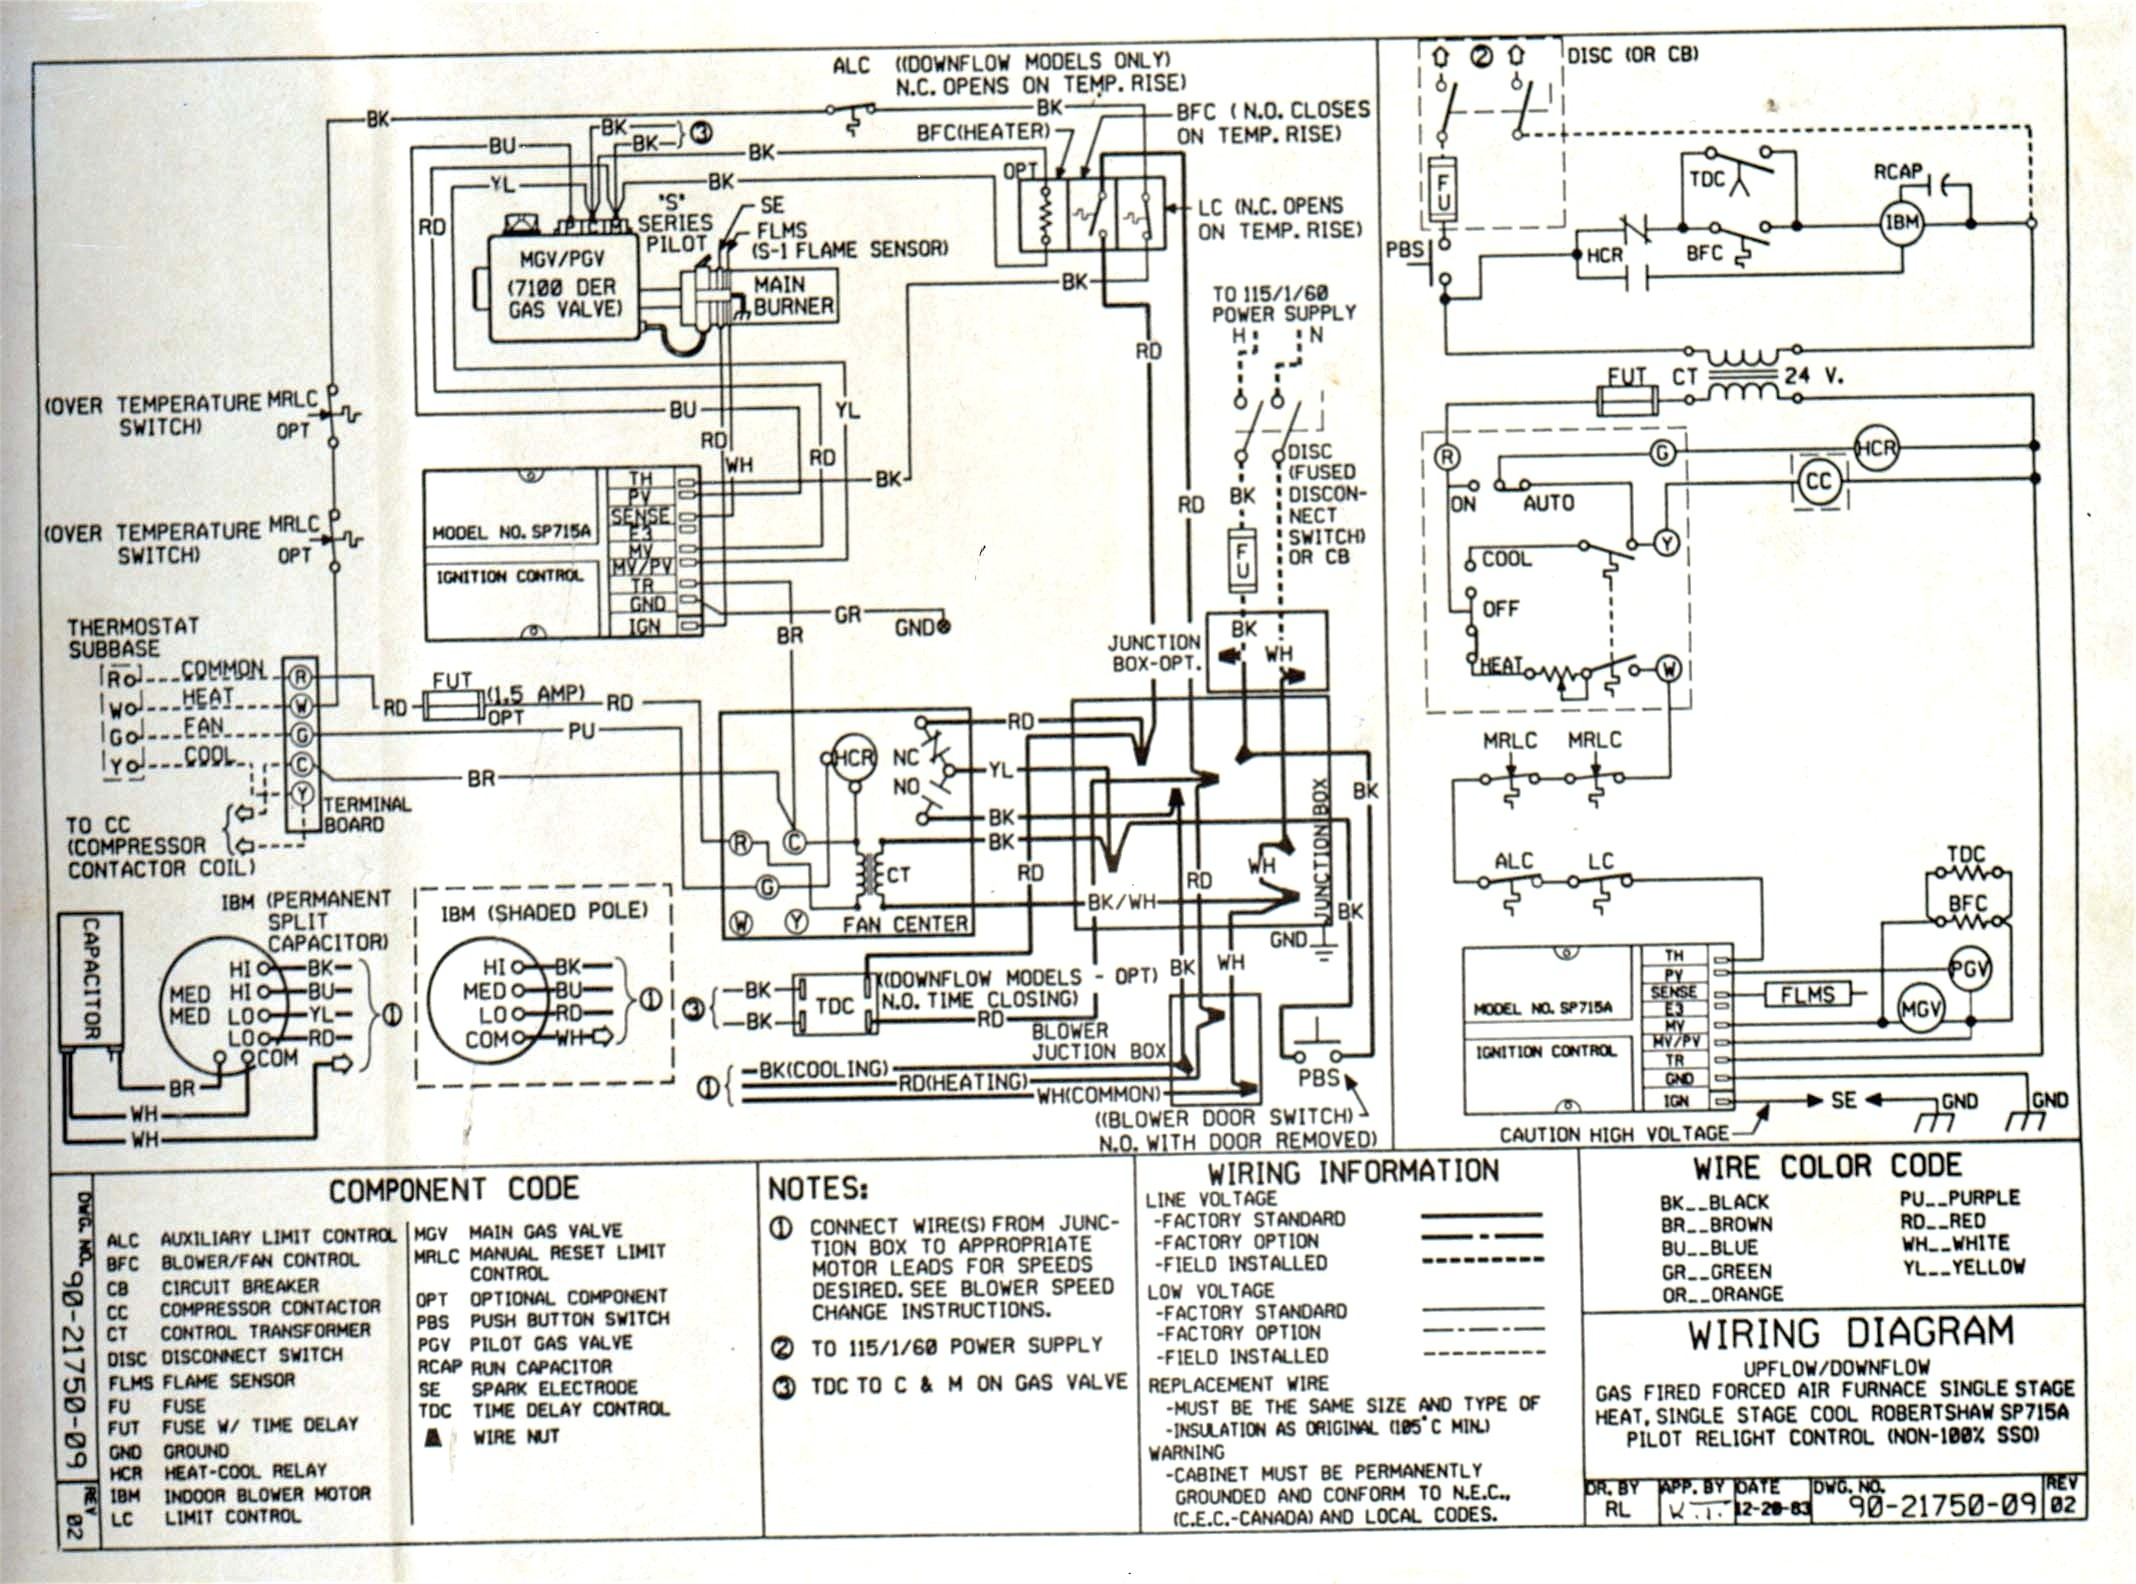 Trane Wsc060 Wiring Diagram